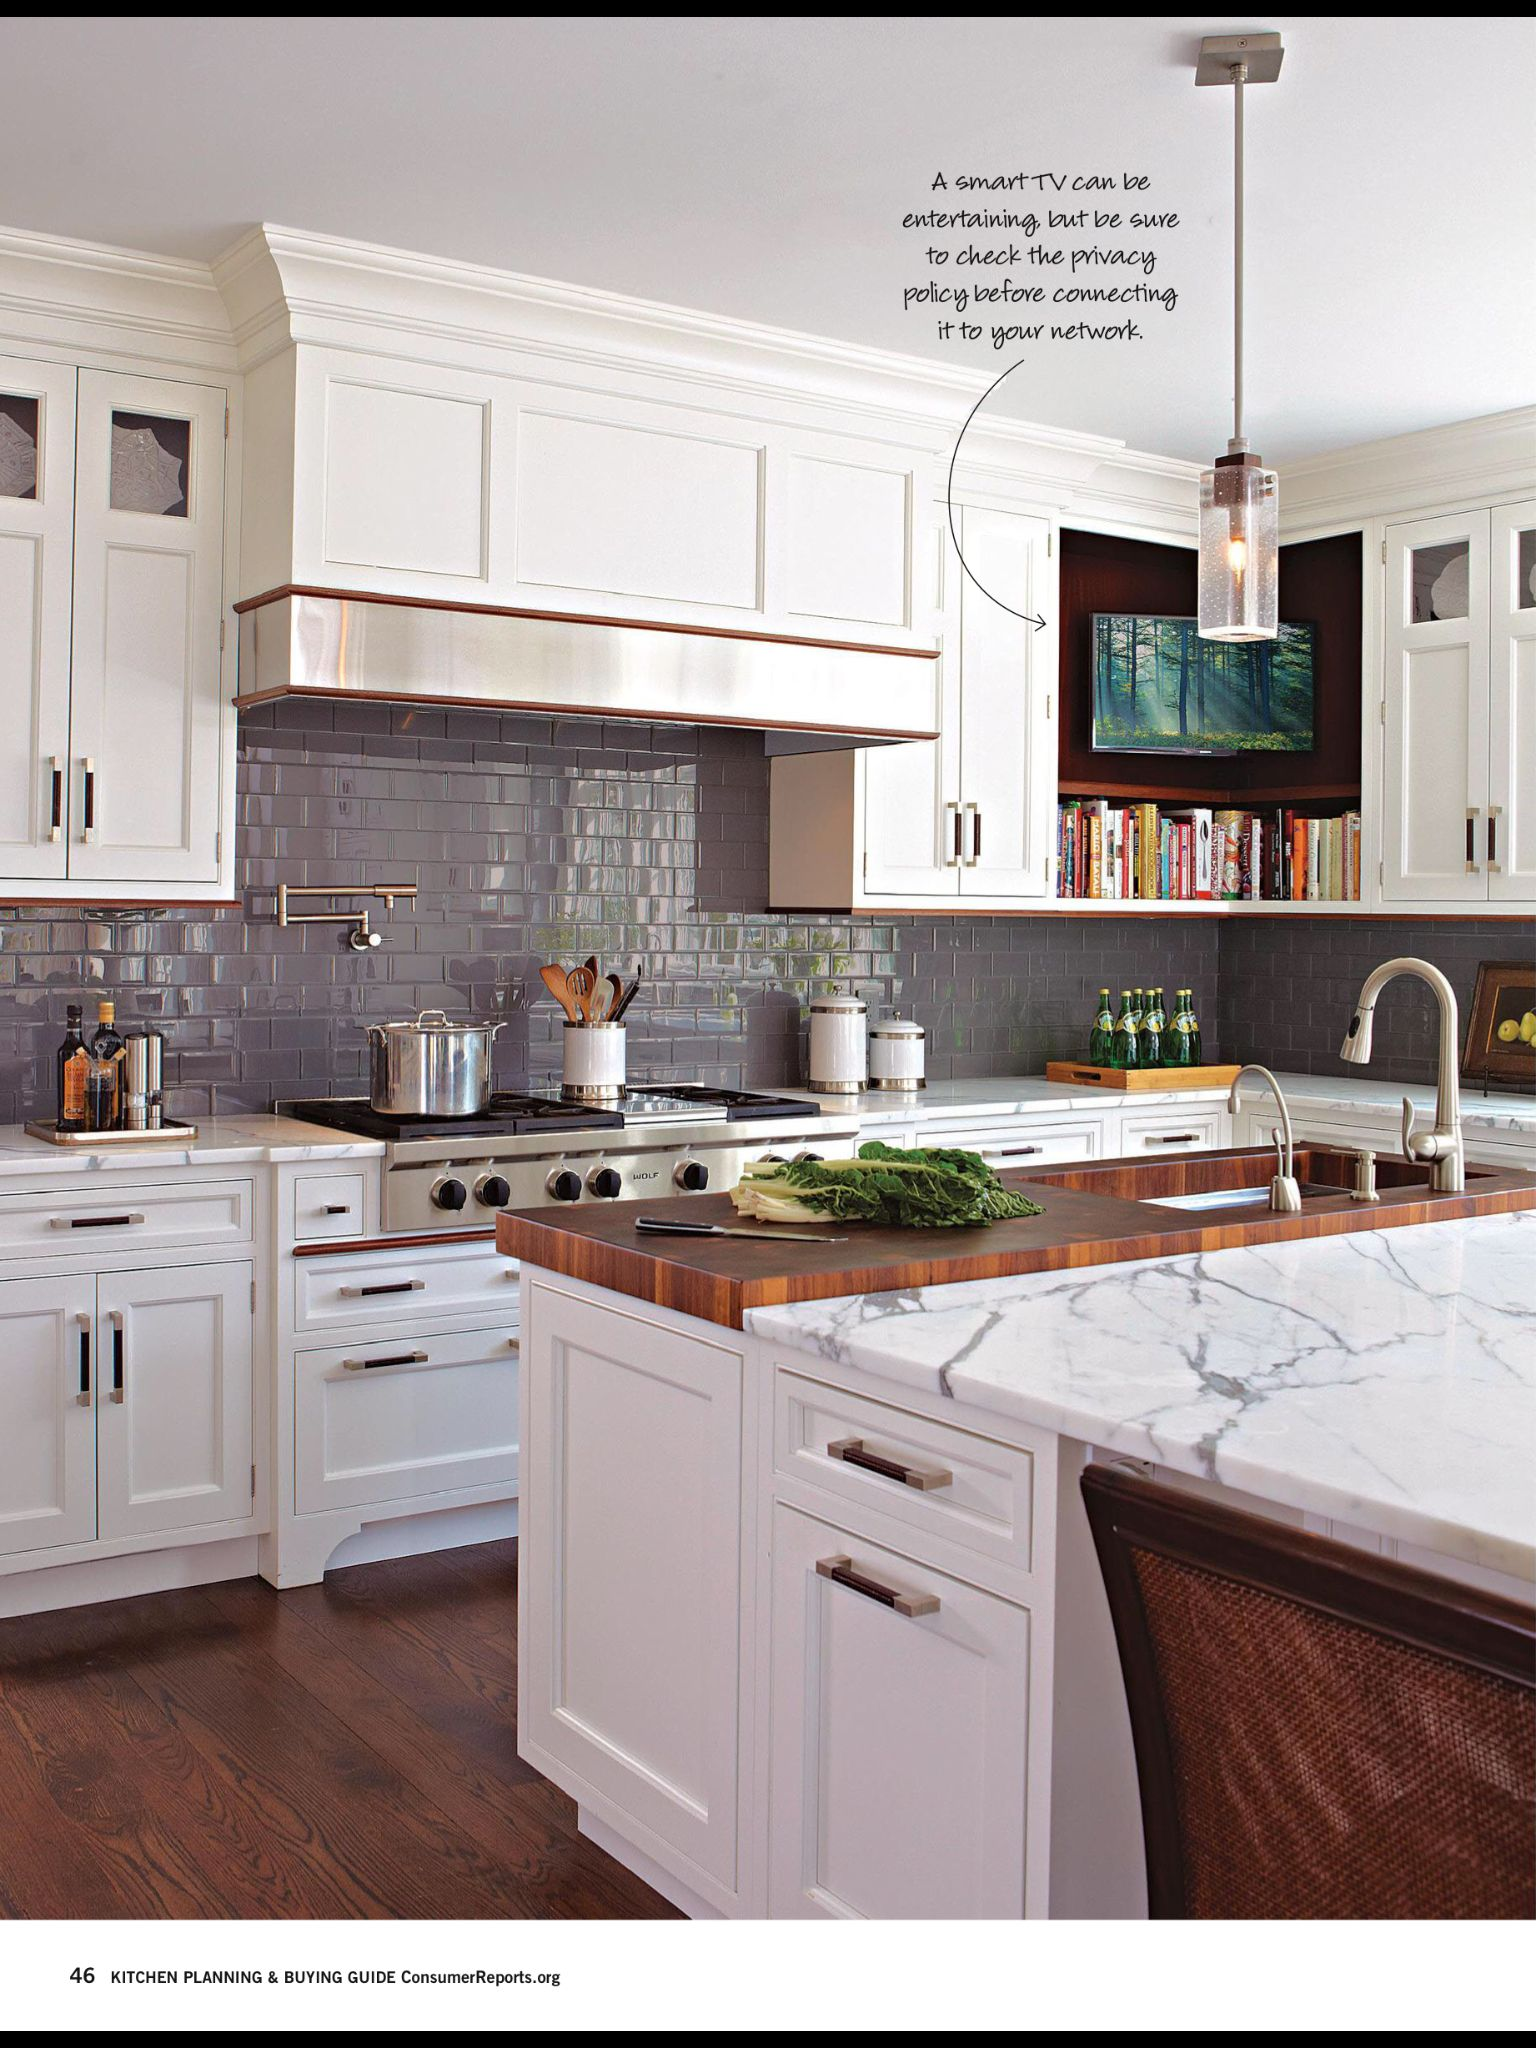 Be Smart About Smart Appliances\